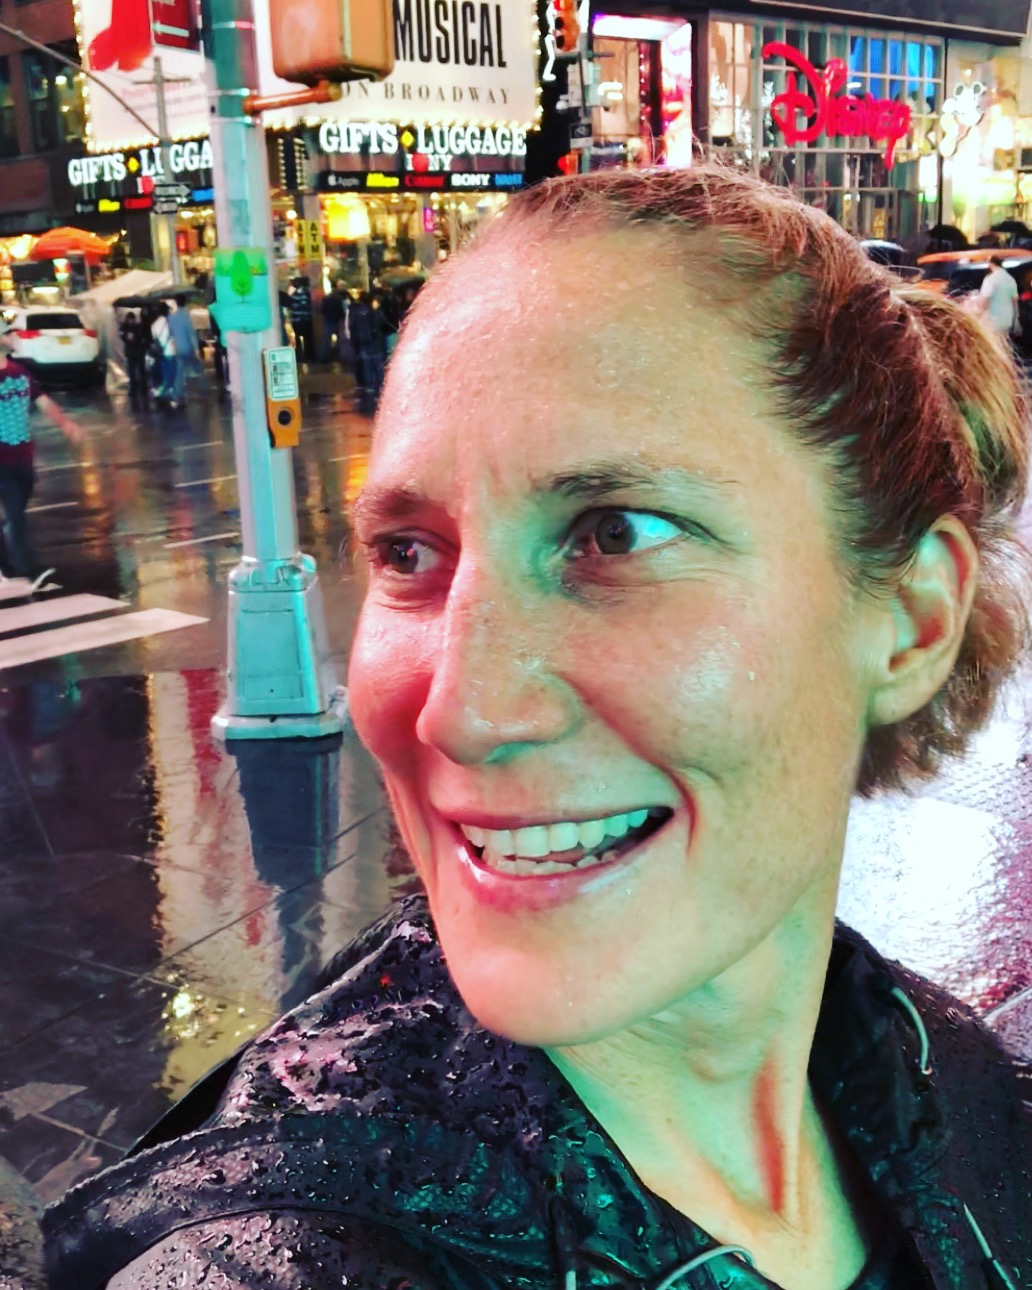 Rainy walk in Times Square, November, 2018.